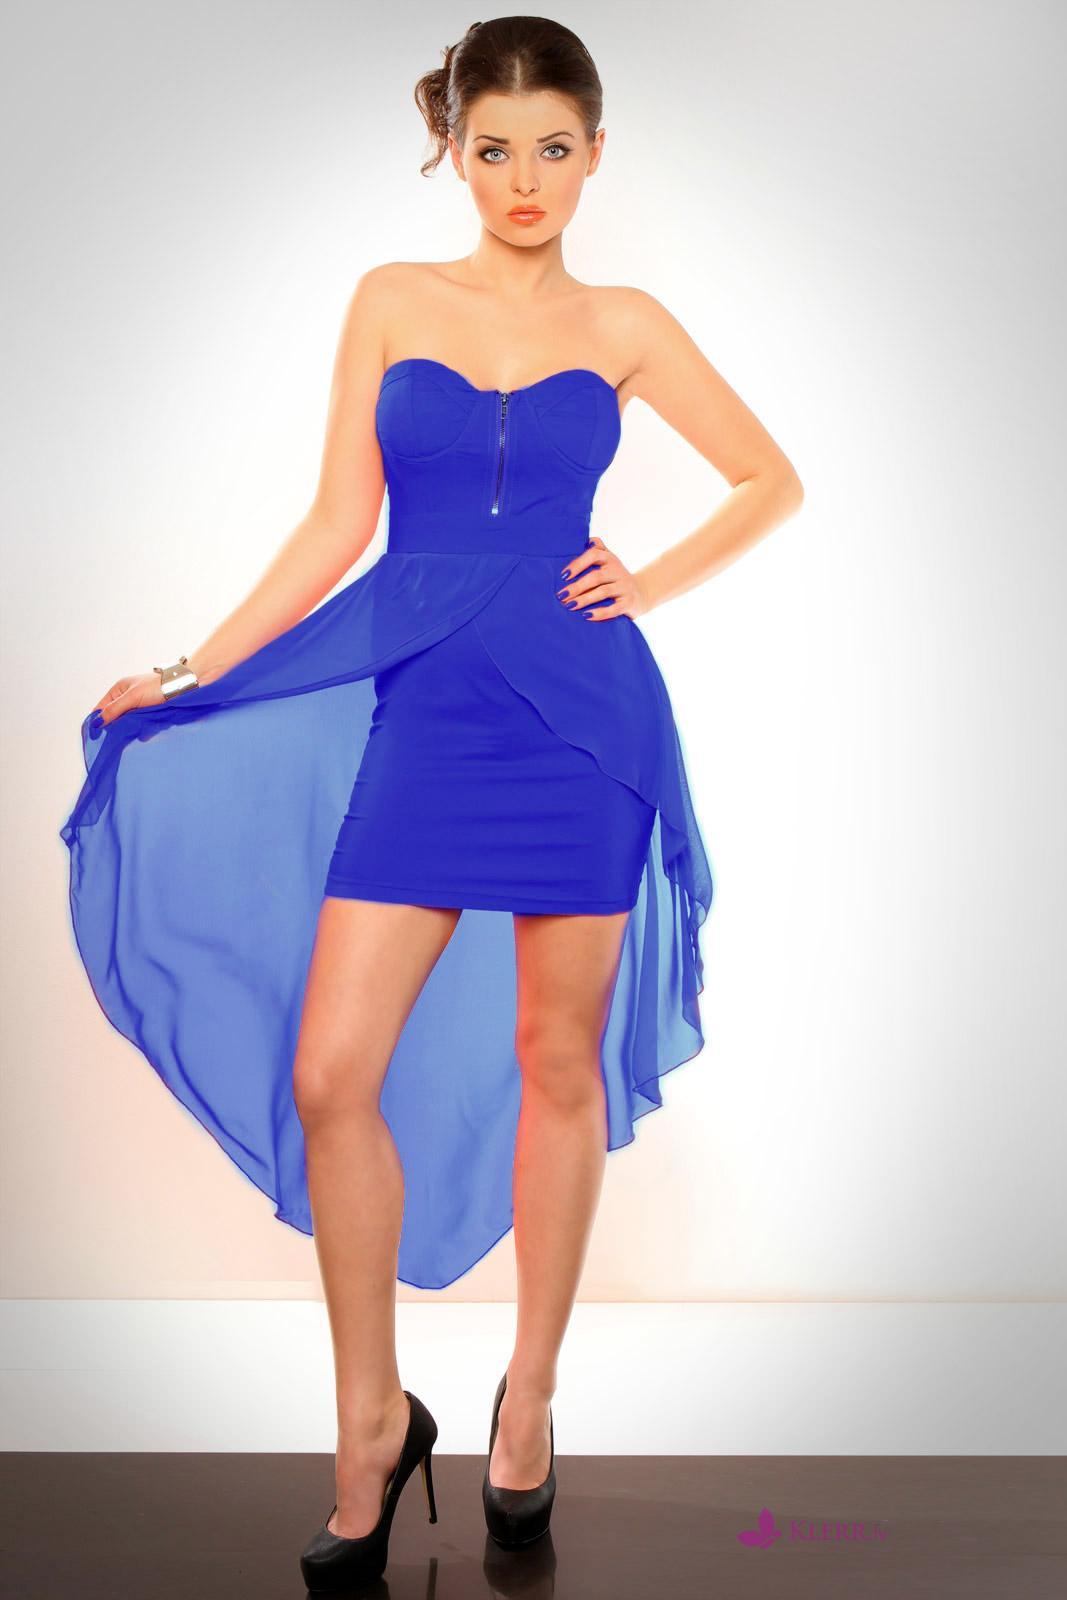 Ddial cesur mini mavi abiye modelleri jpg download image modatrendler com wp content uploads mini mavi tek askili elbise